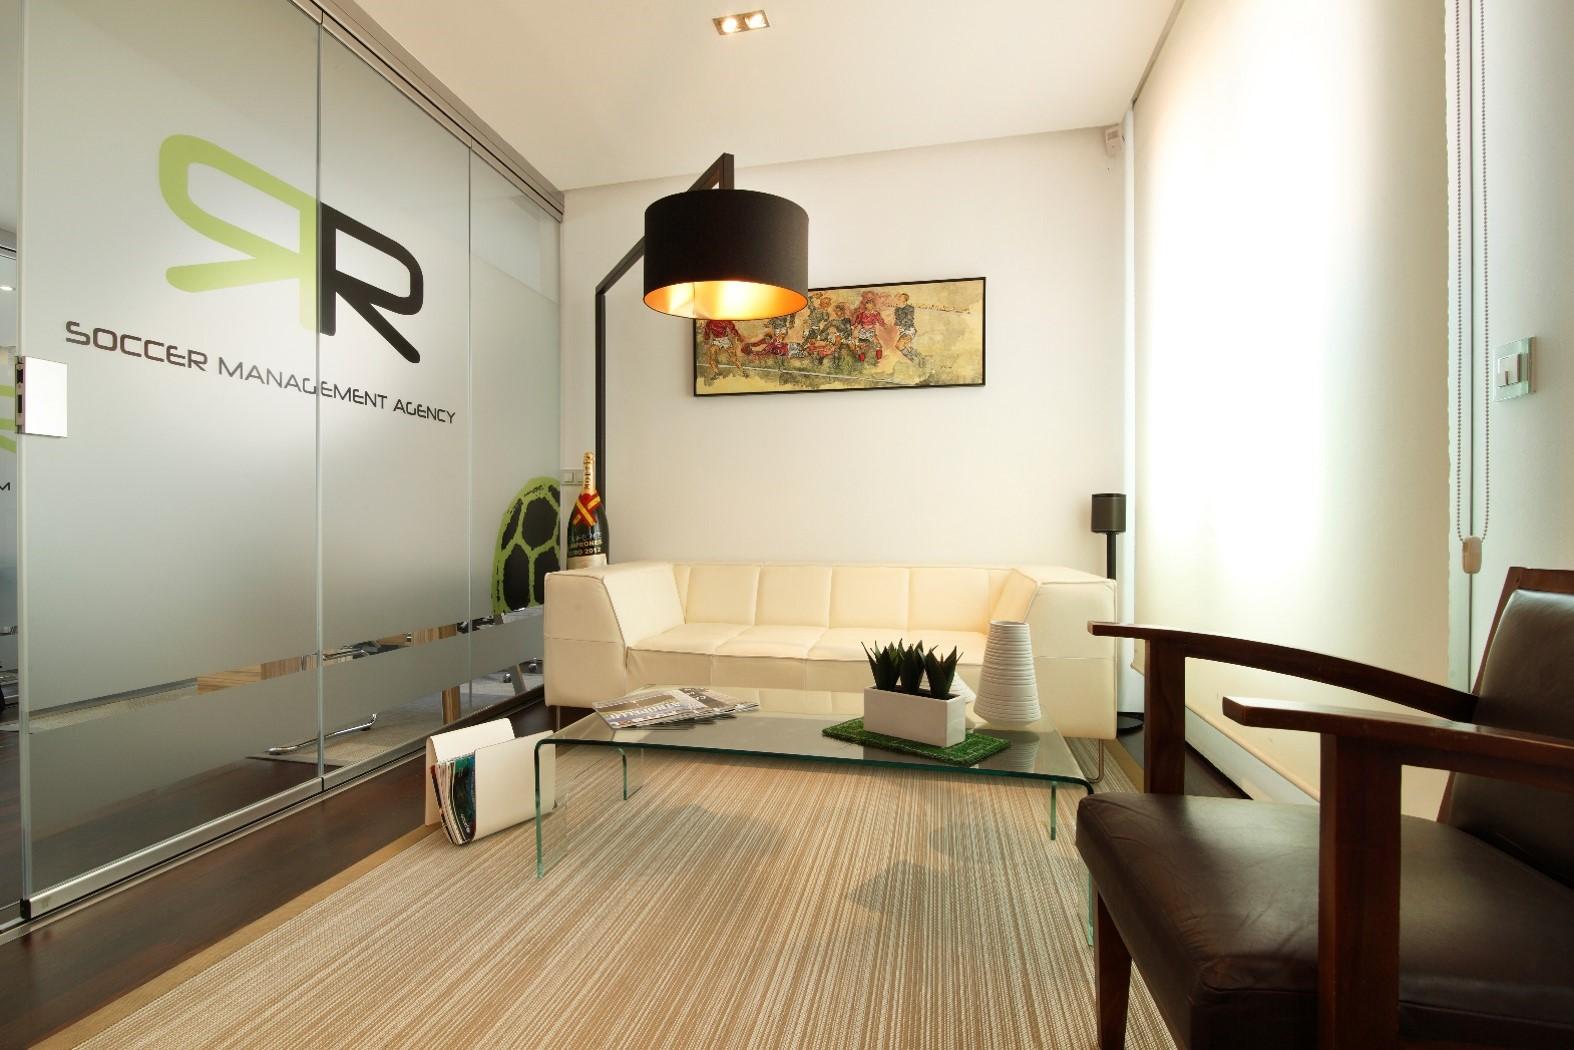 Oficina René Ramos Soccer Management Agency